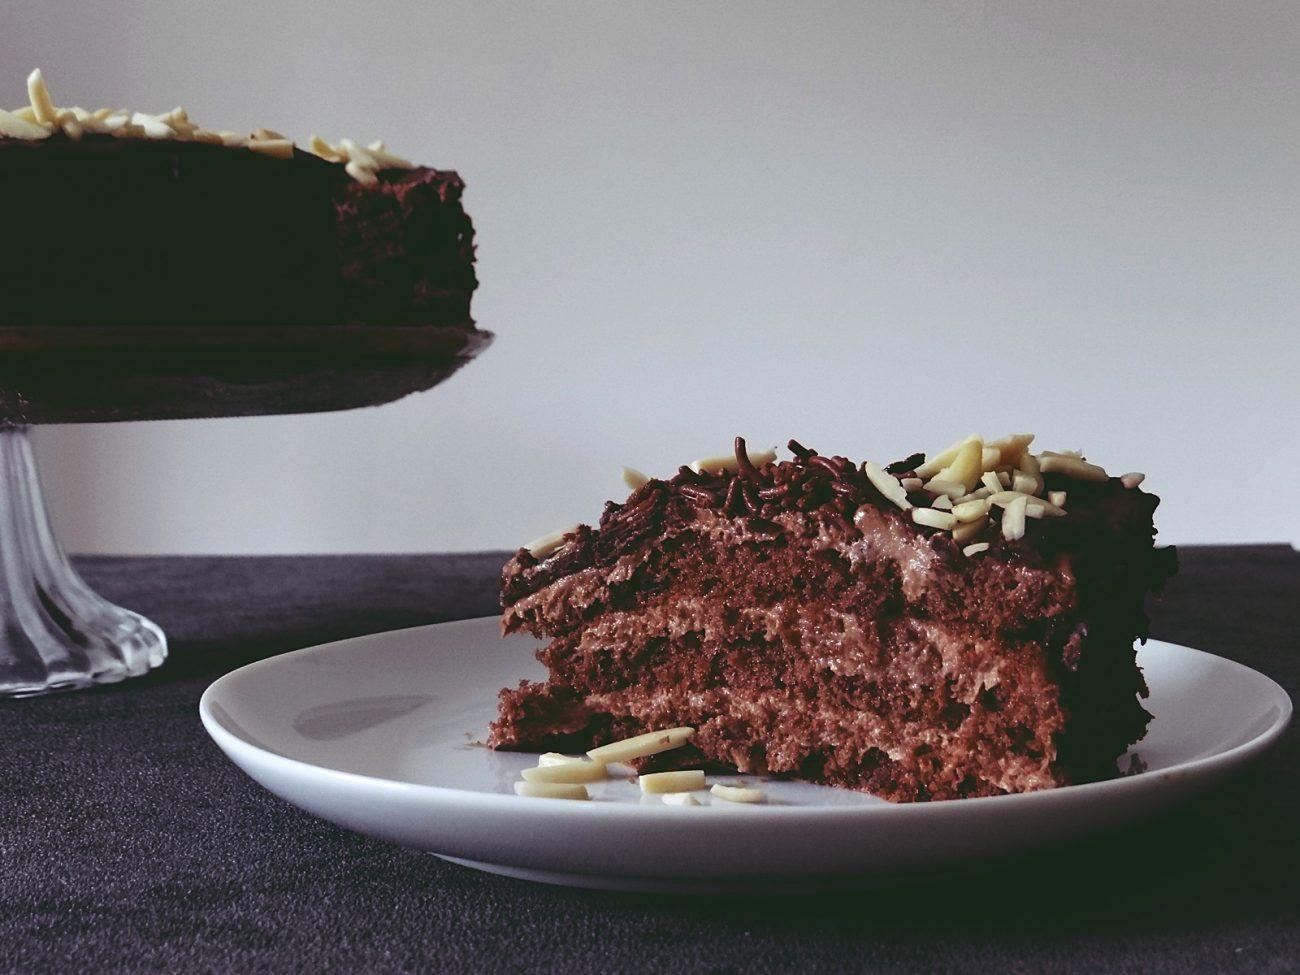 Schoko Kirsch Kuchen Mit Vanille Quark Fullung Unalife Schoko Kirsch Kuchen Saftiger Schoko Kirsch Kuchen Kuchen